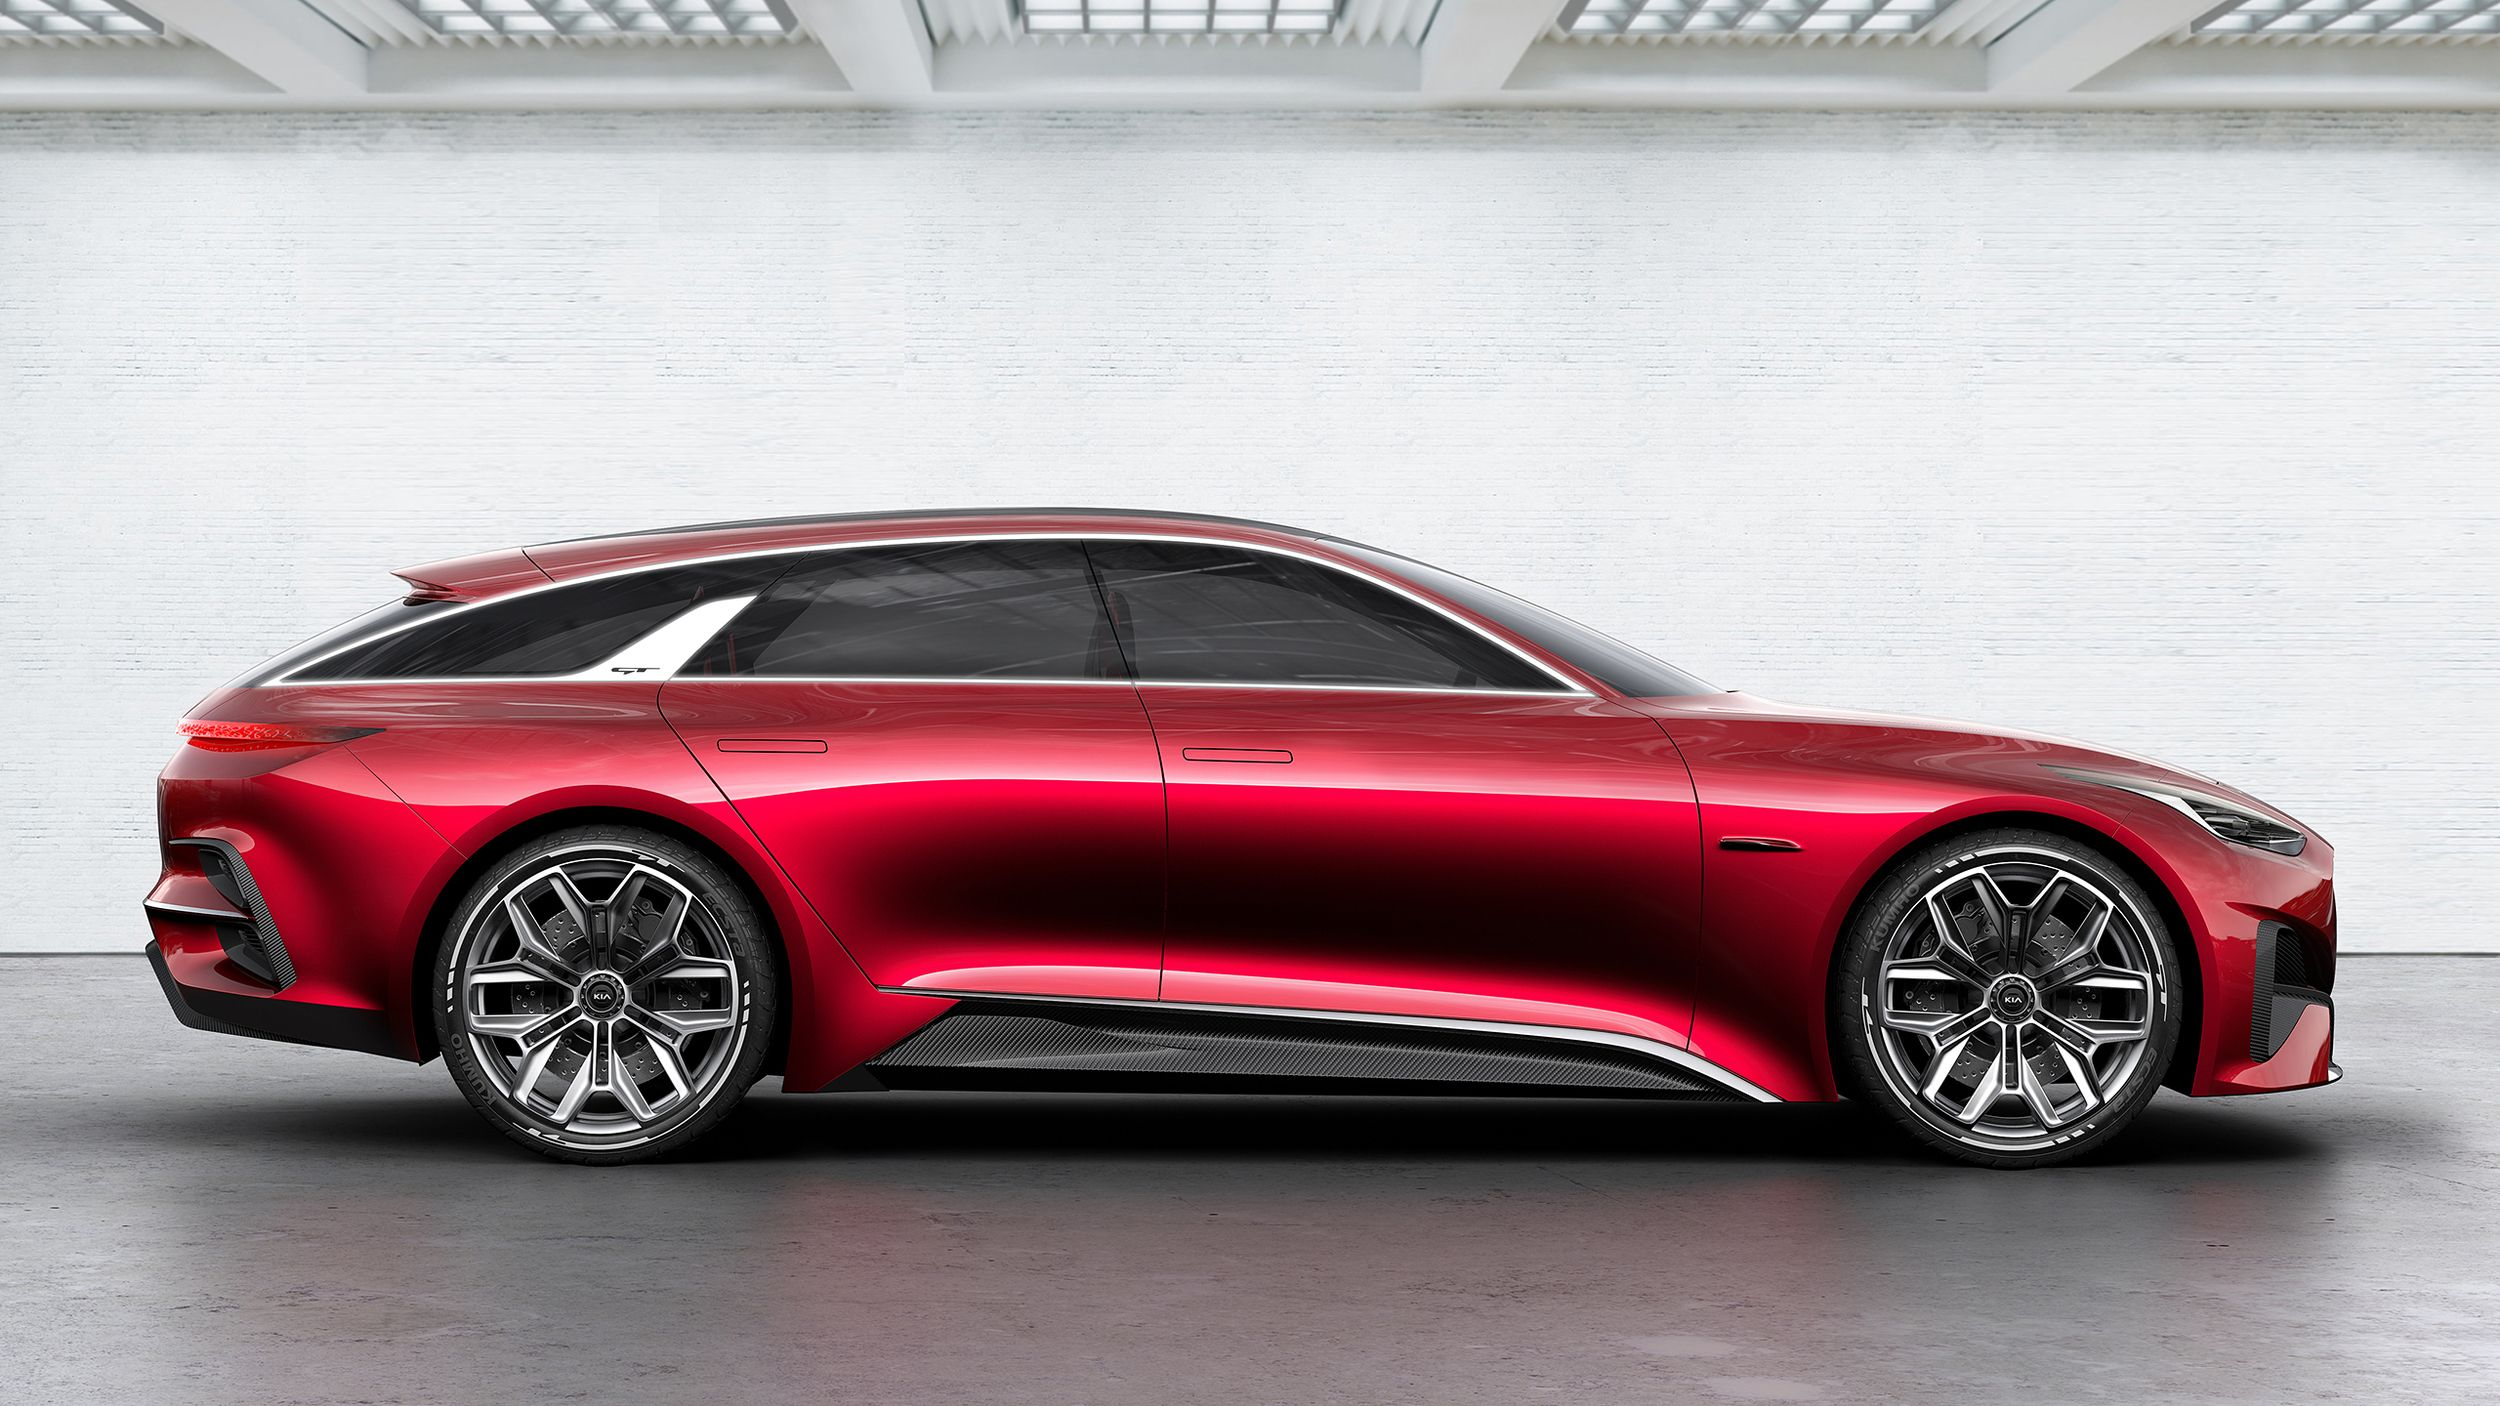 Kia Proceed S Nifty Details Automotive Perfumes And Lavish Design Touches Concept Cars Kia Design Kia proceed concept frankfurt motor show